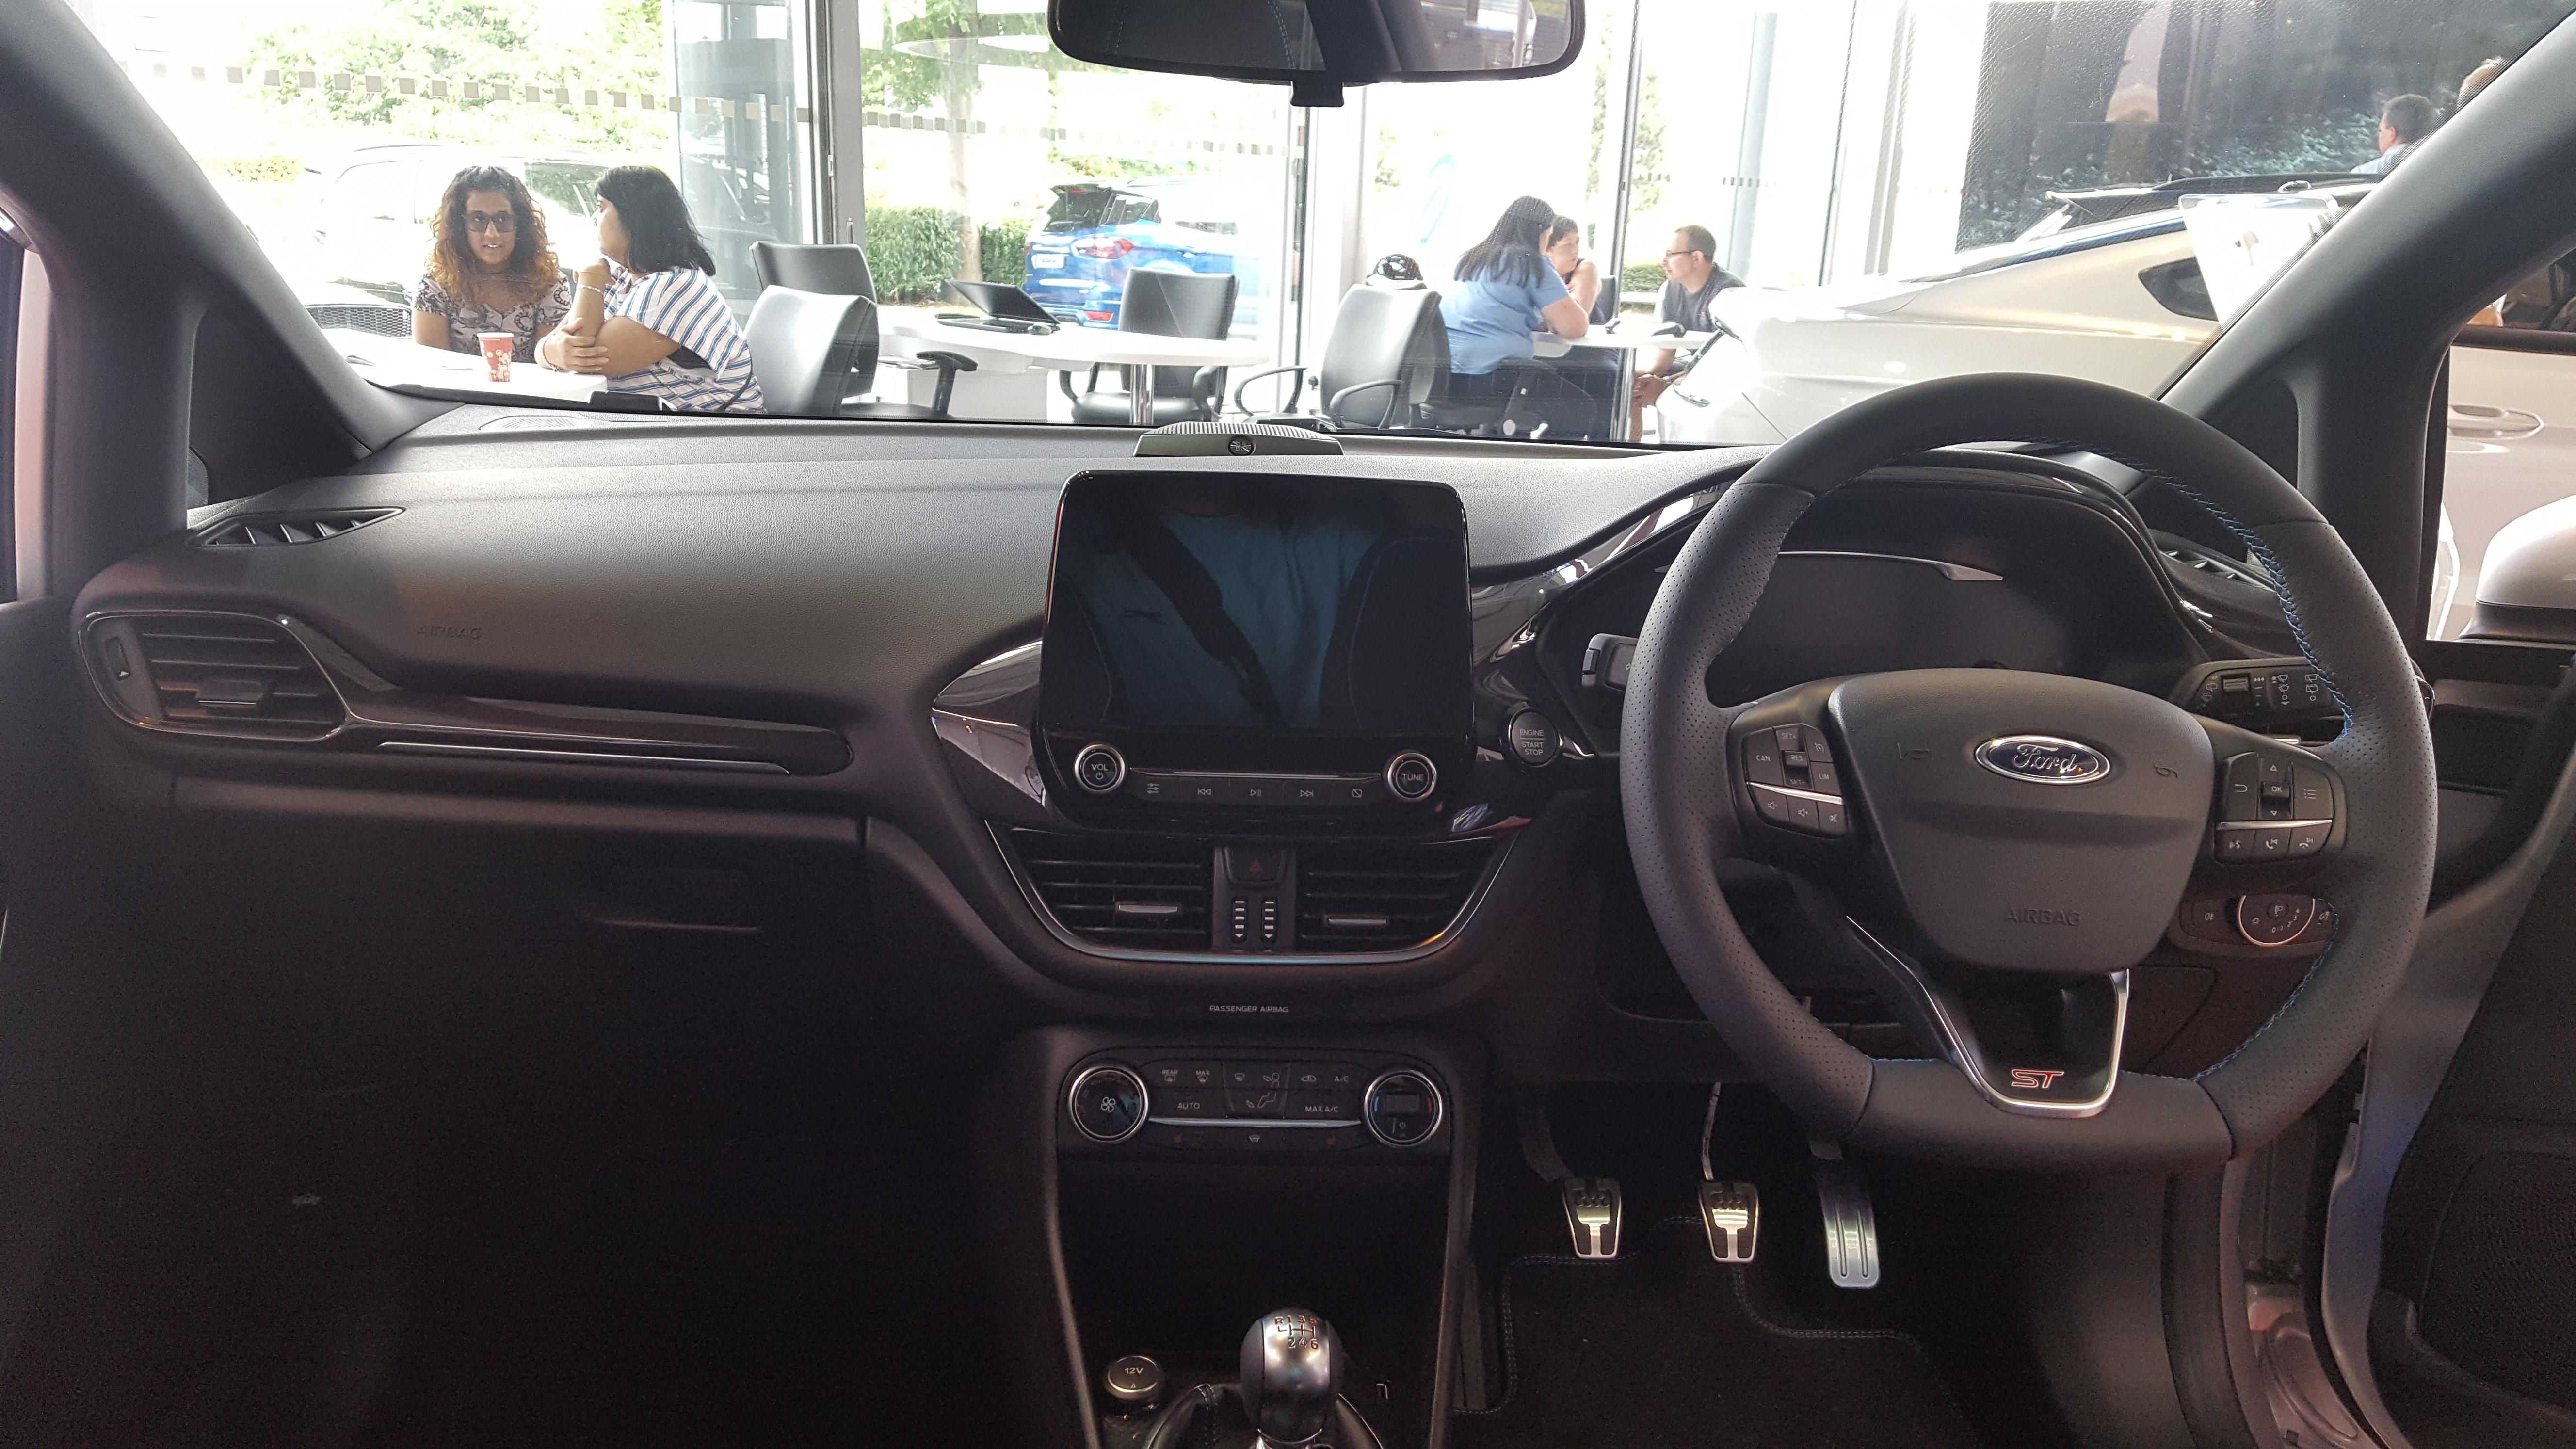 File:2018 Ford Fiesta ST 1.5 Interior